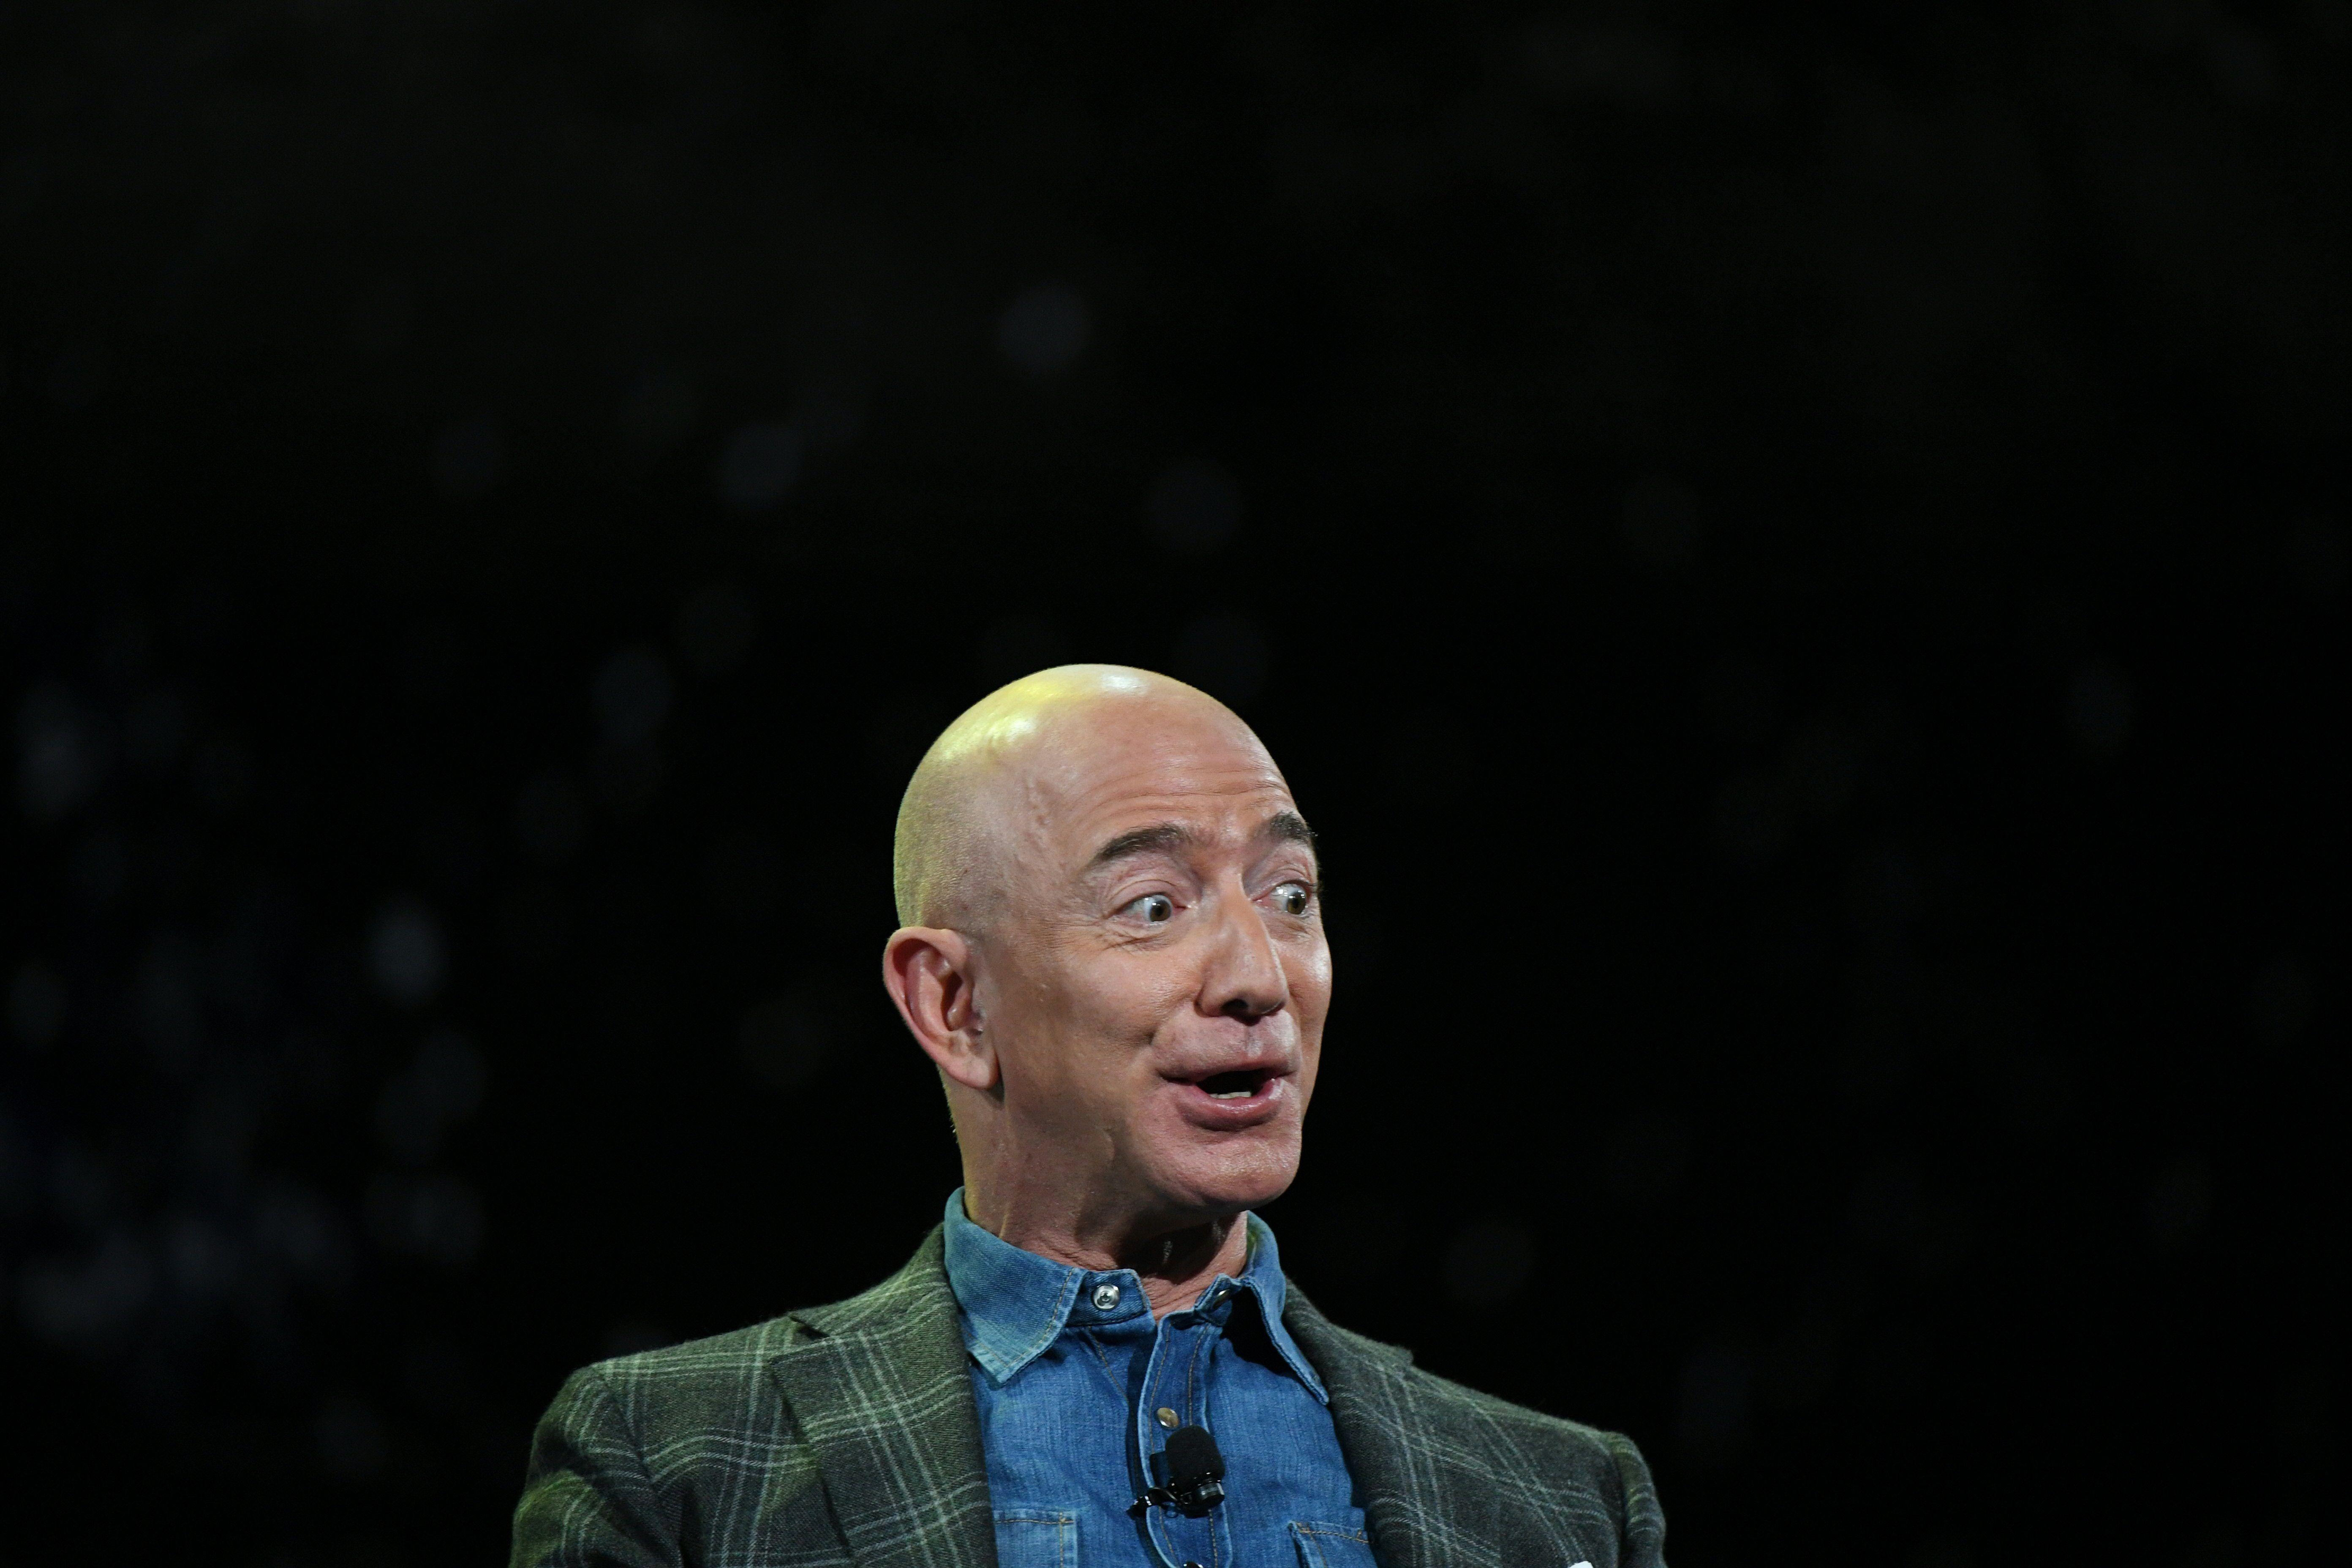 Bezos's $10 billion Earth Fund could shape Earth in Bezos's favor